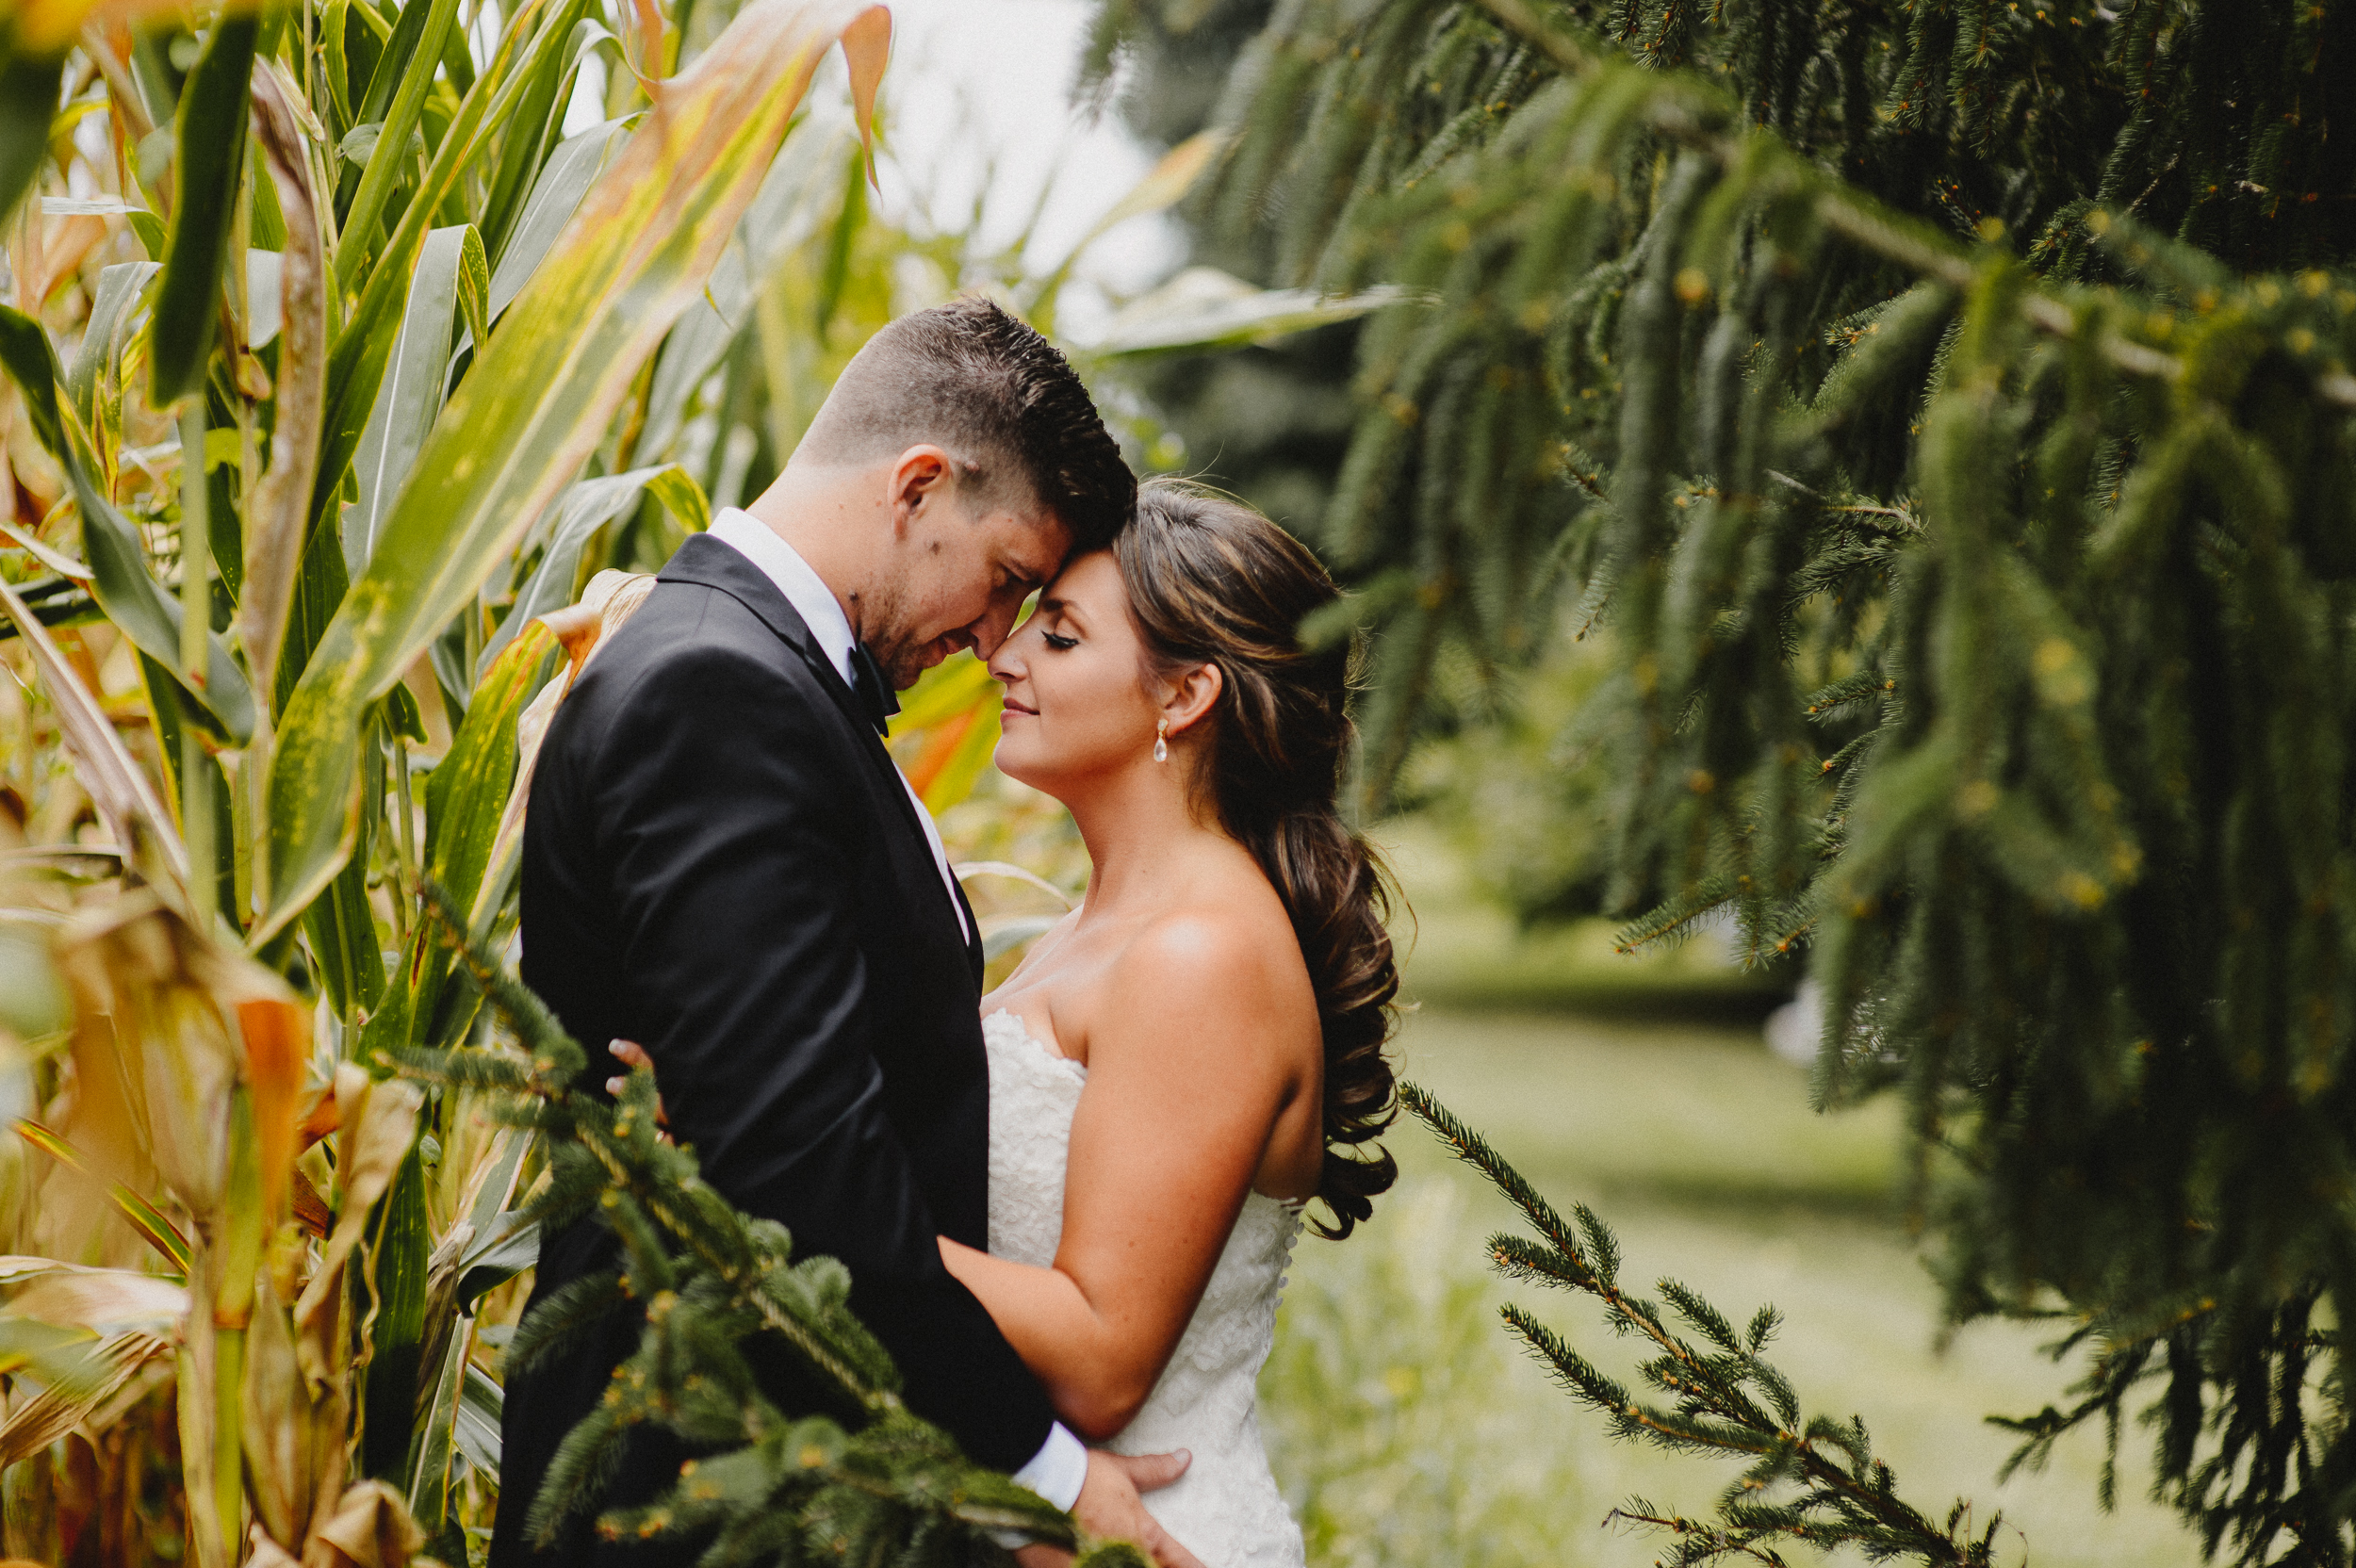 delaware-estate-wedding-photographer-pat-robinson-photography-64.jpg